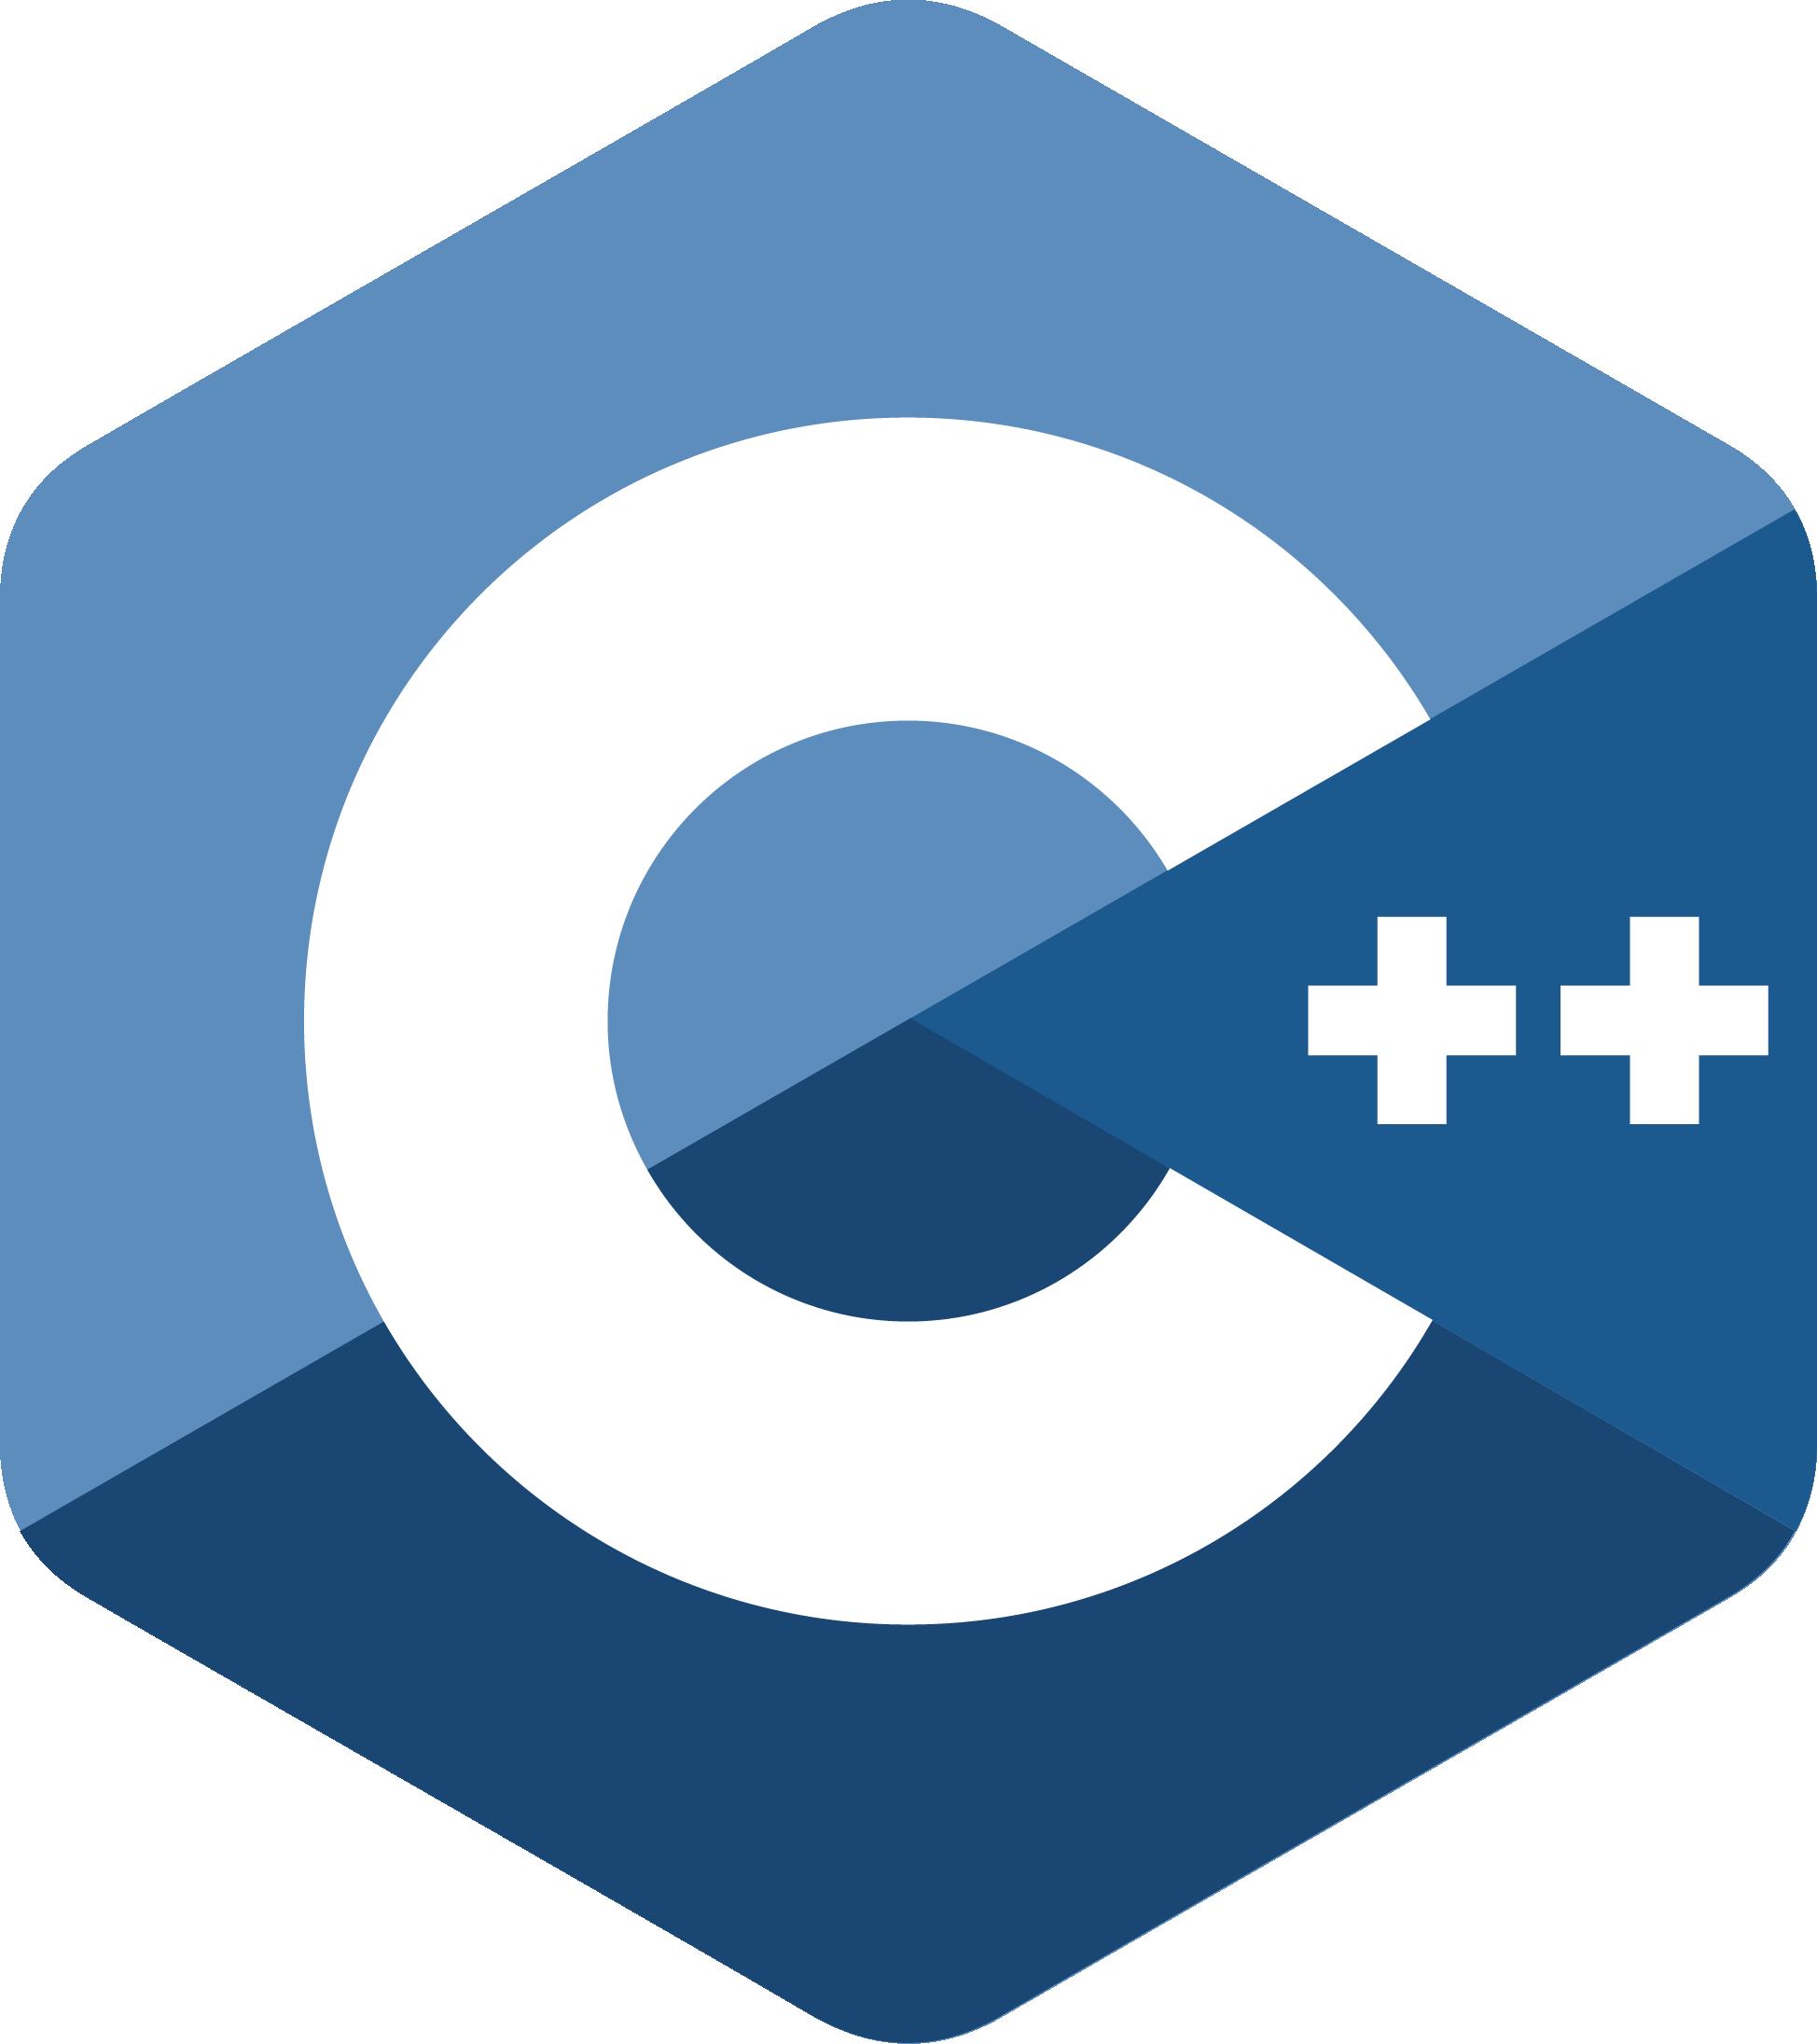 C Logo Learn C Programming Languages Coding